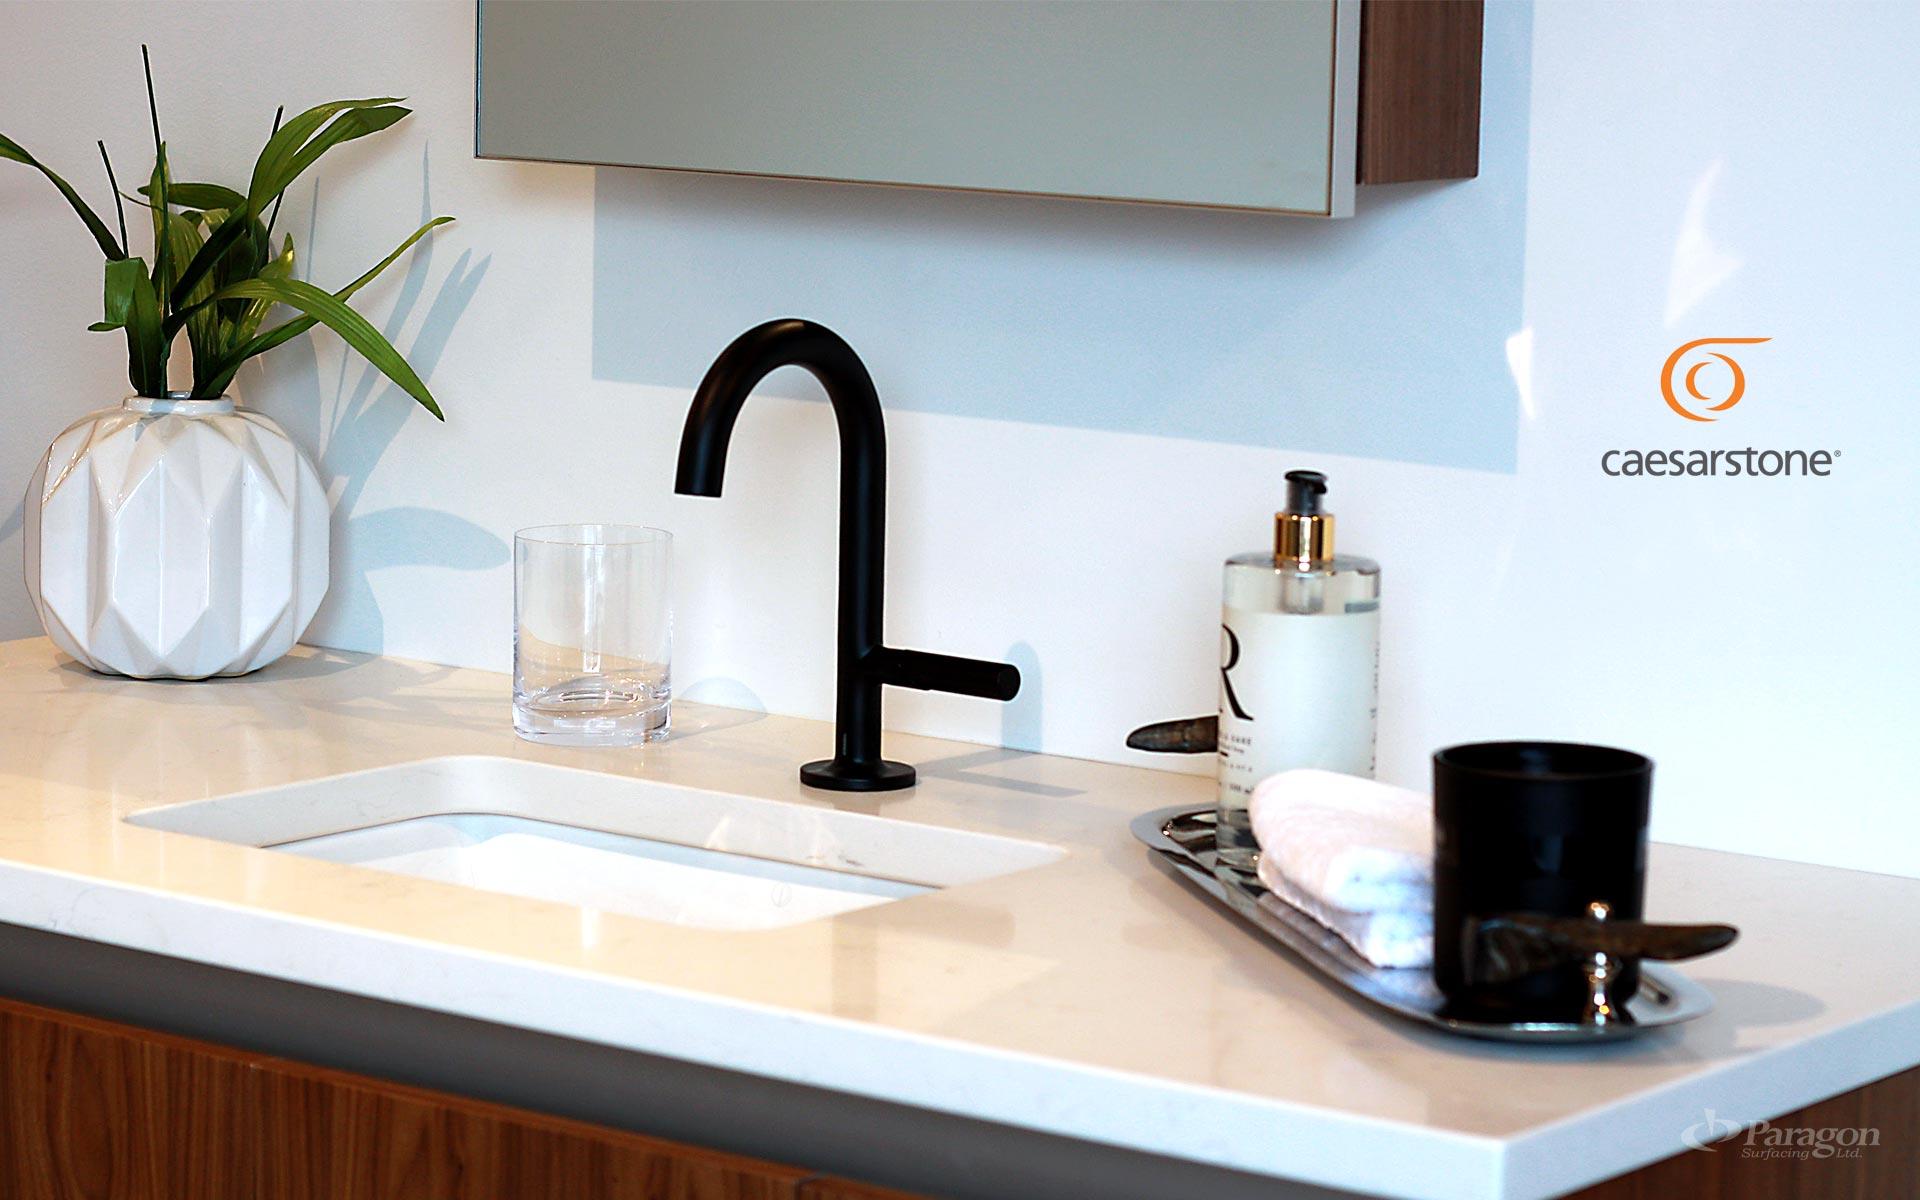 Bon Home / Countertops / Caesarstone Quartz Countertops